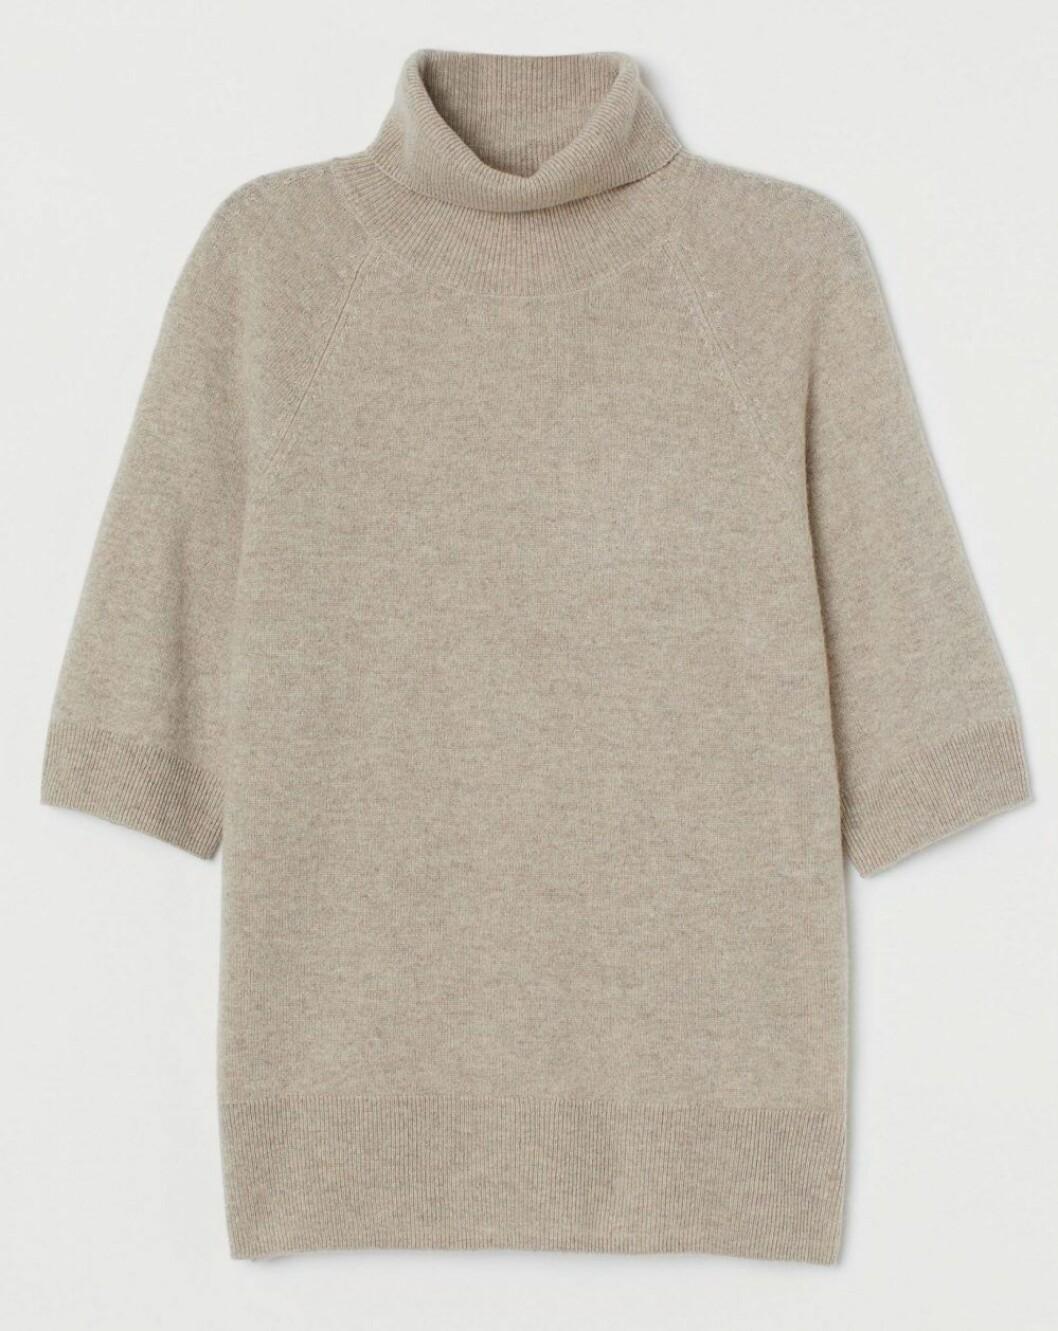 Kortärmad sandfärgad polotröja i kashmir från H&M.